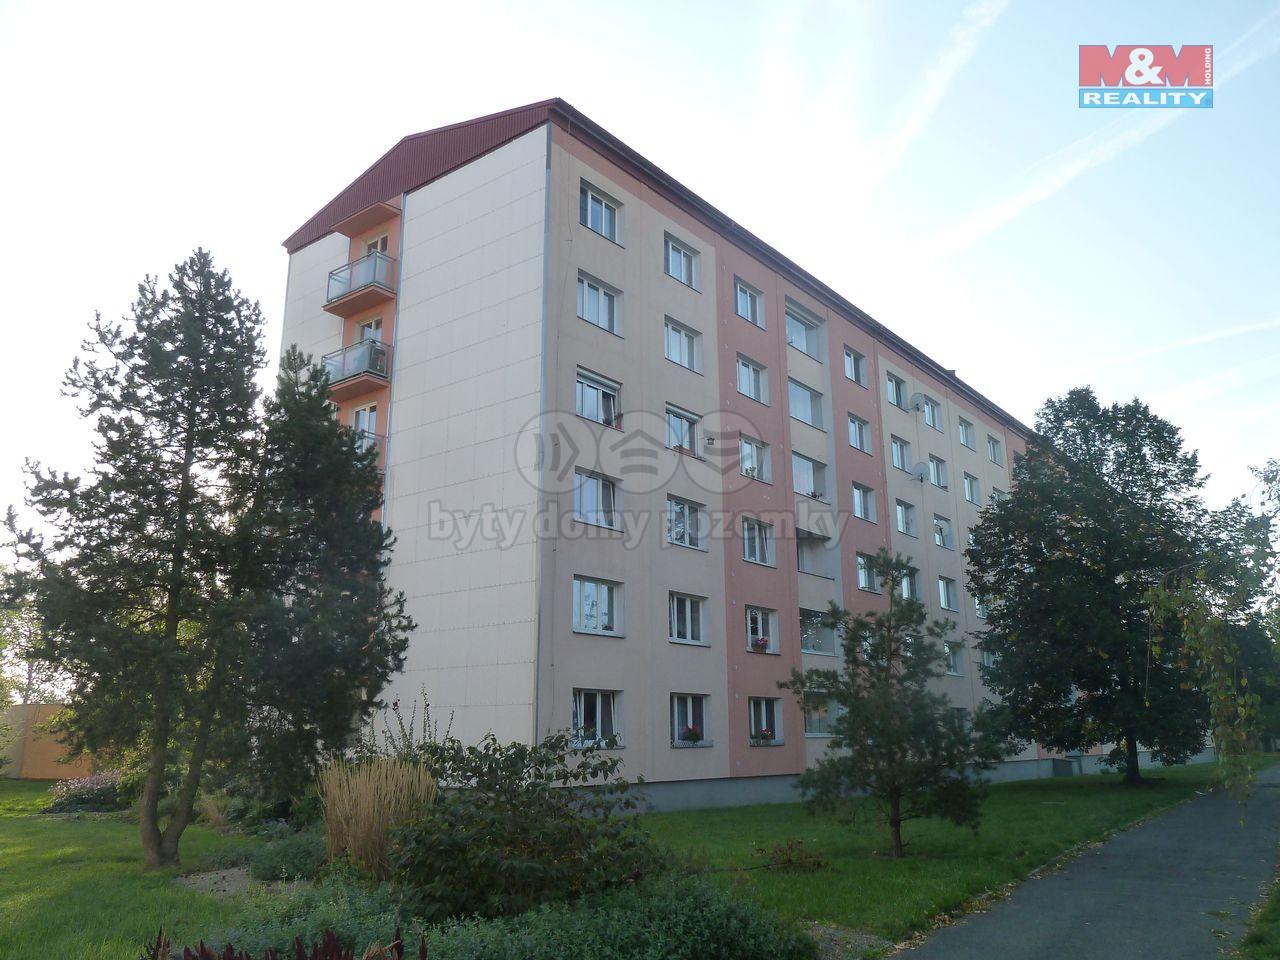 Prodej, byt 3+1, 66 m2, Cheb, ul. Na Hradčanech